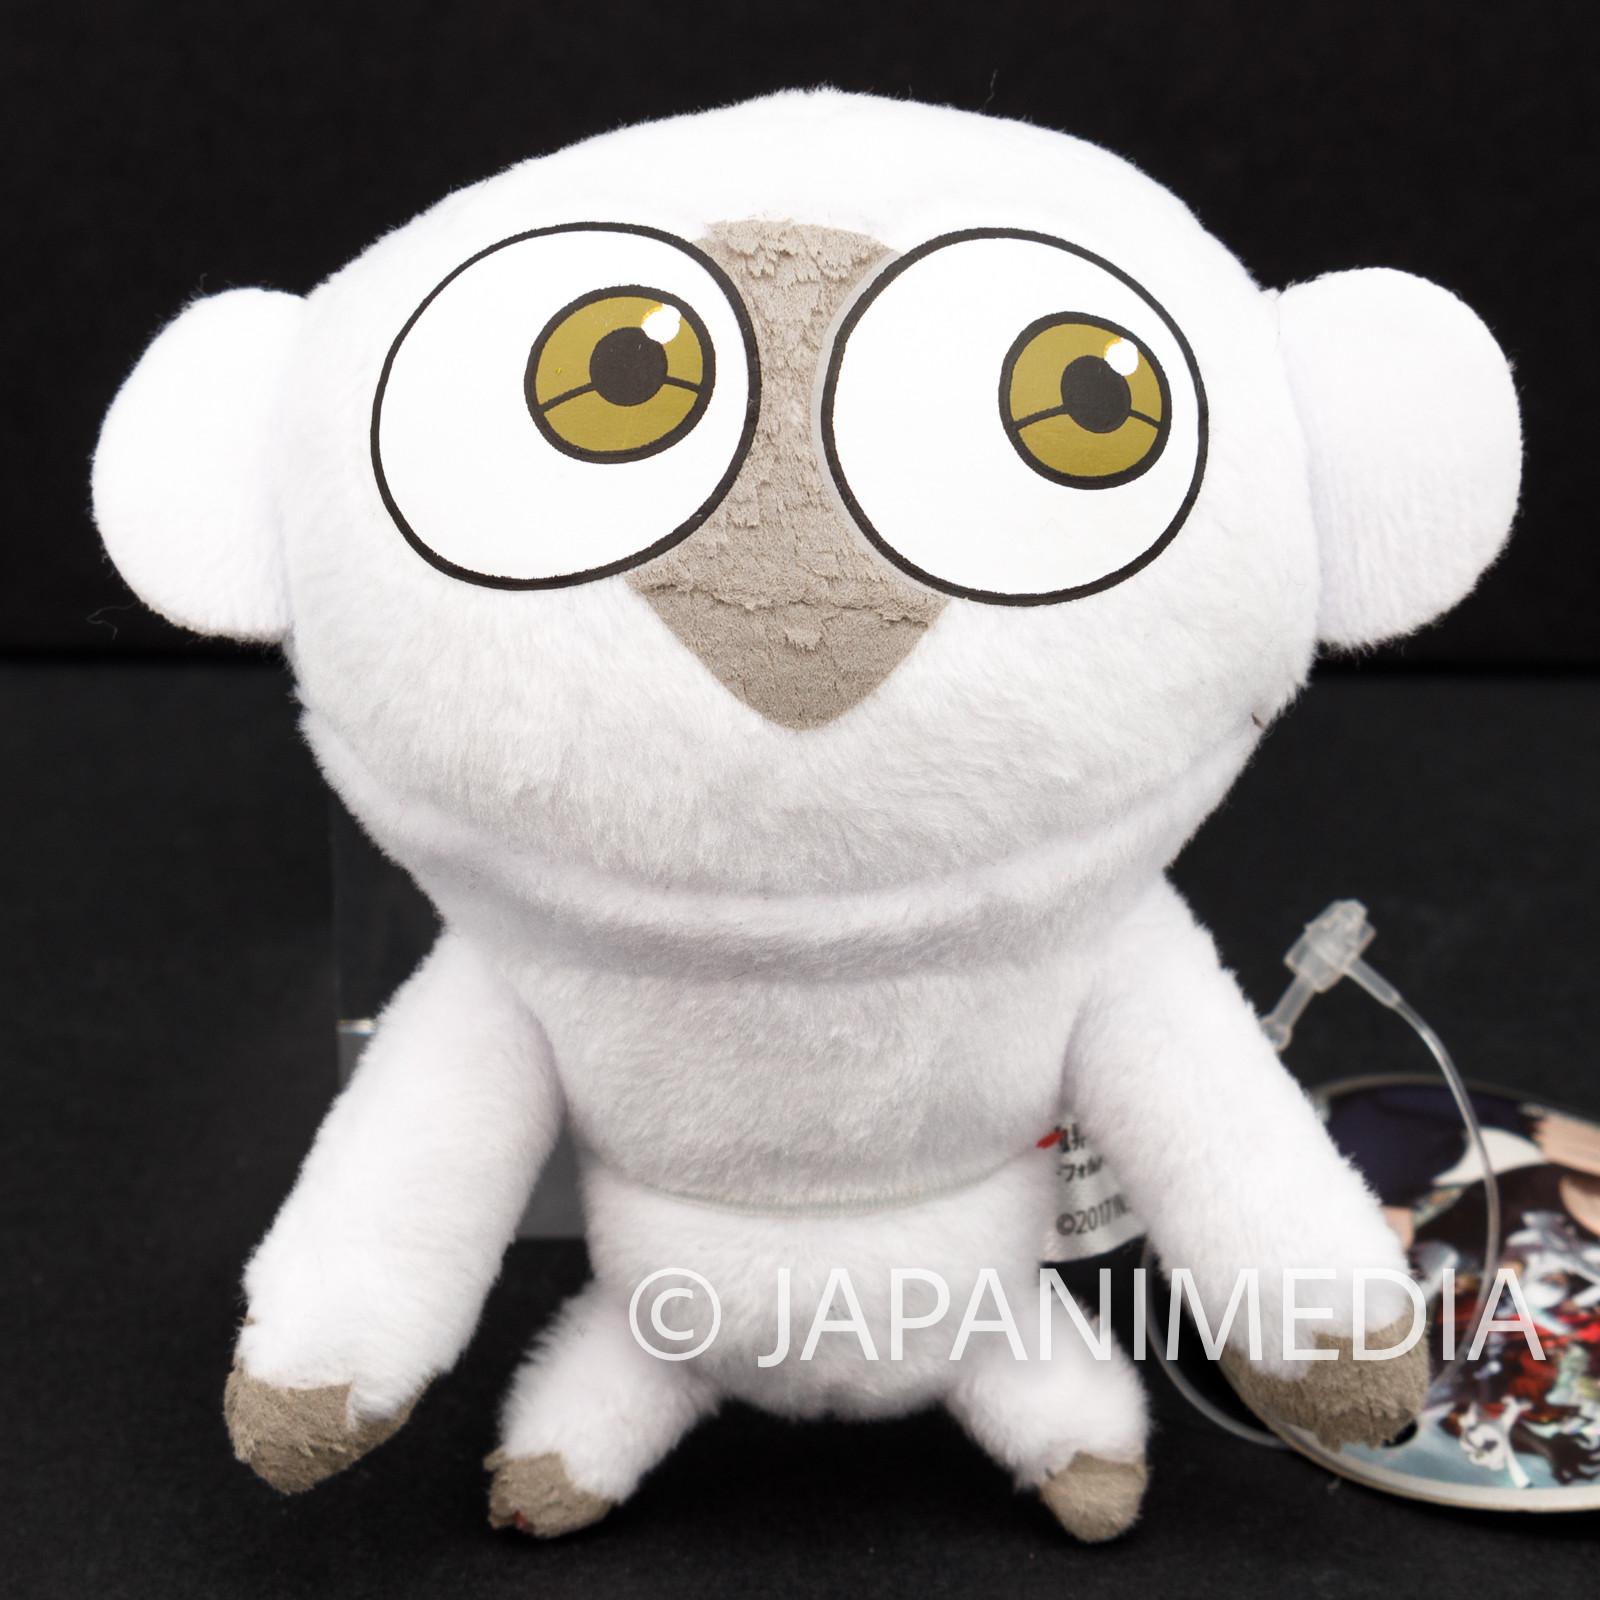 Blood Blockade Battlefront Sonic Plush Doll JAPAN ANIME 2